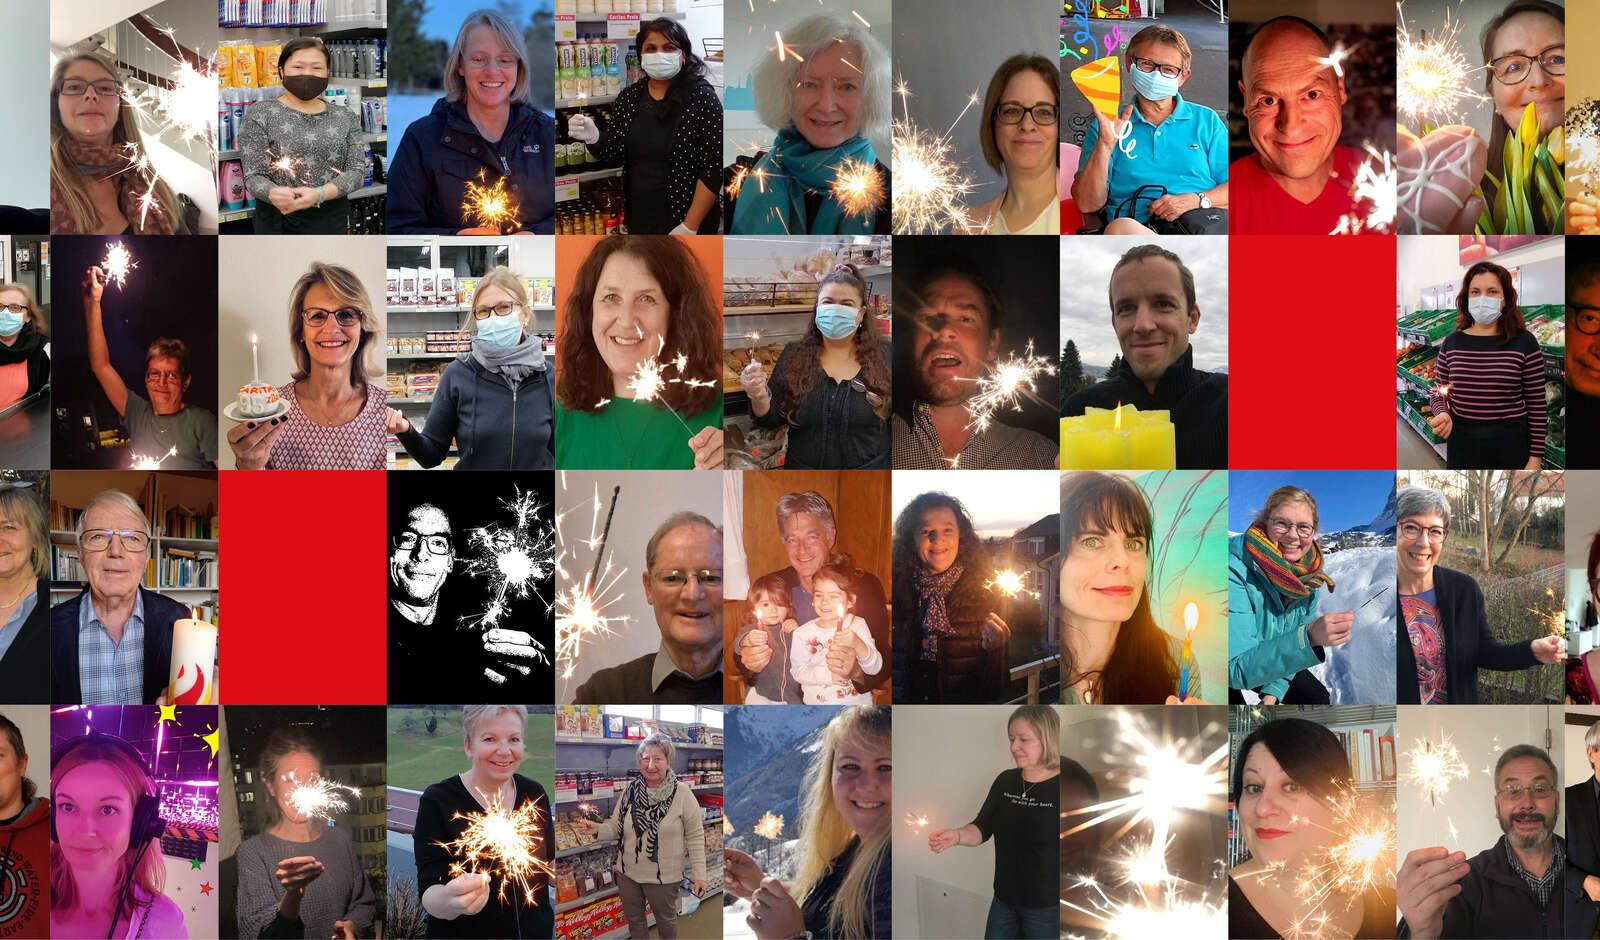 Happy Birthday, Caritas!